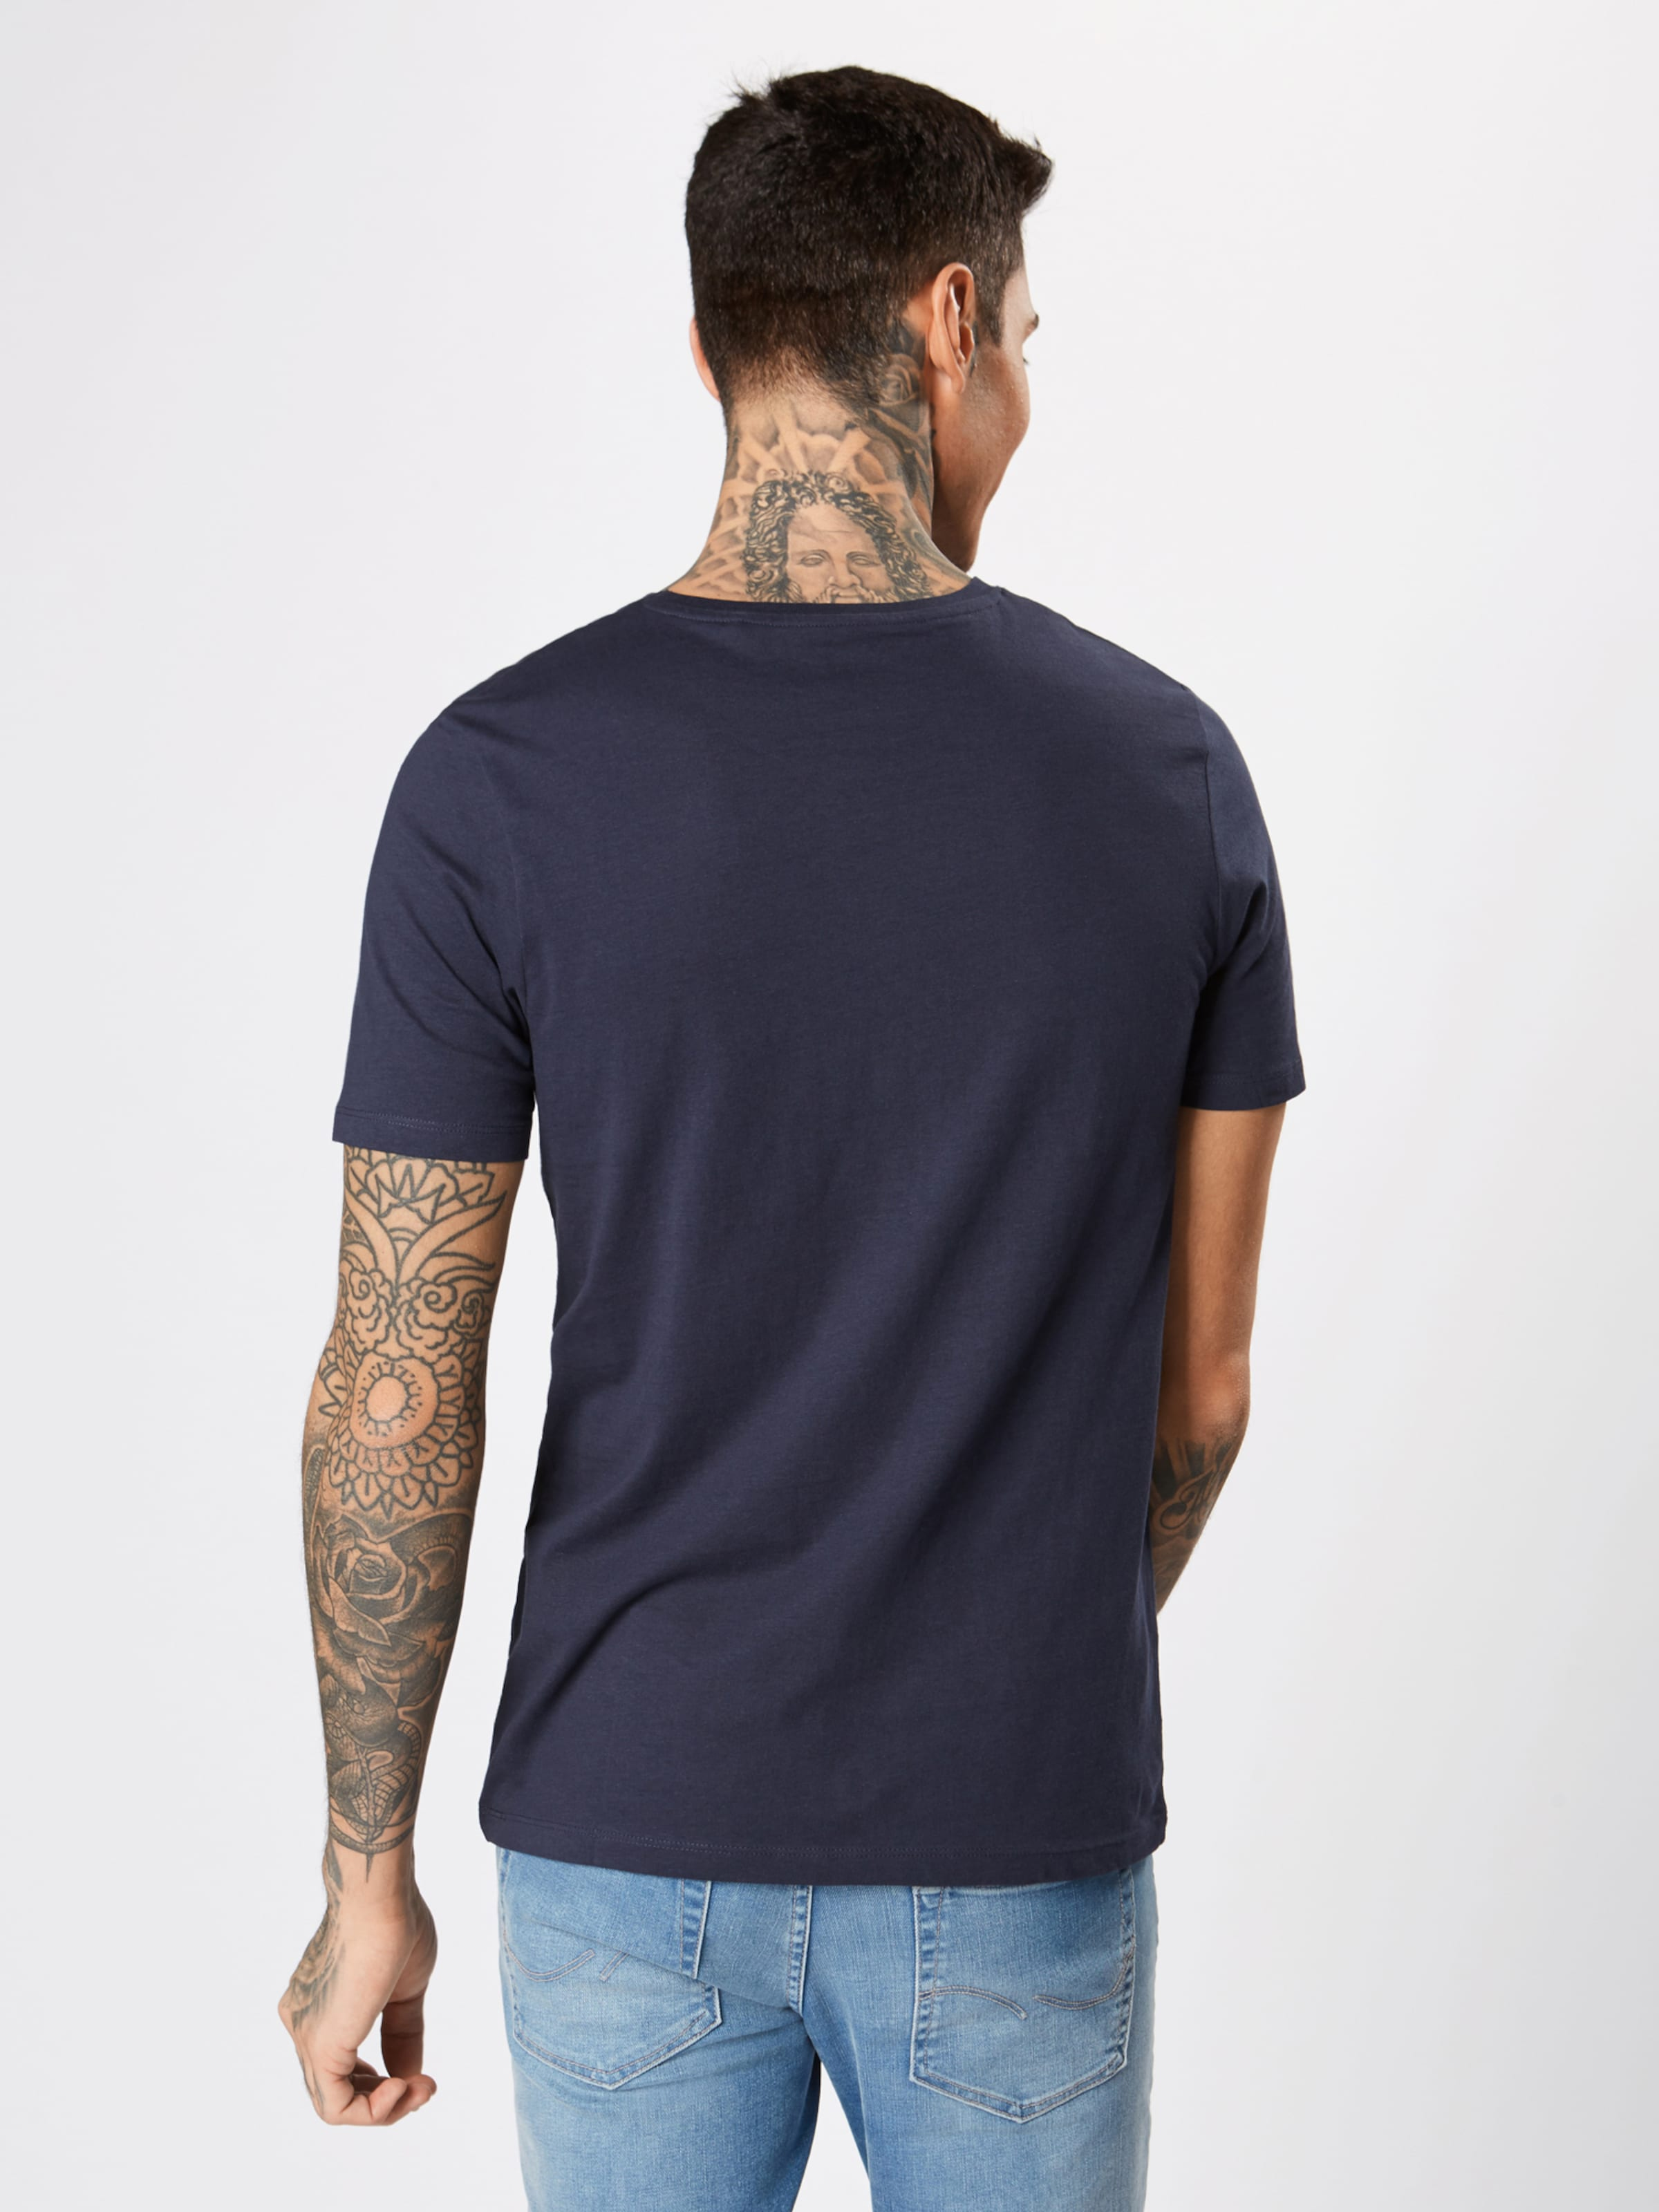 Bleu T Jones Jackamp; En shirt MarineBlanc qSUpzMVG